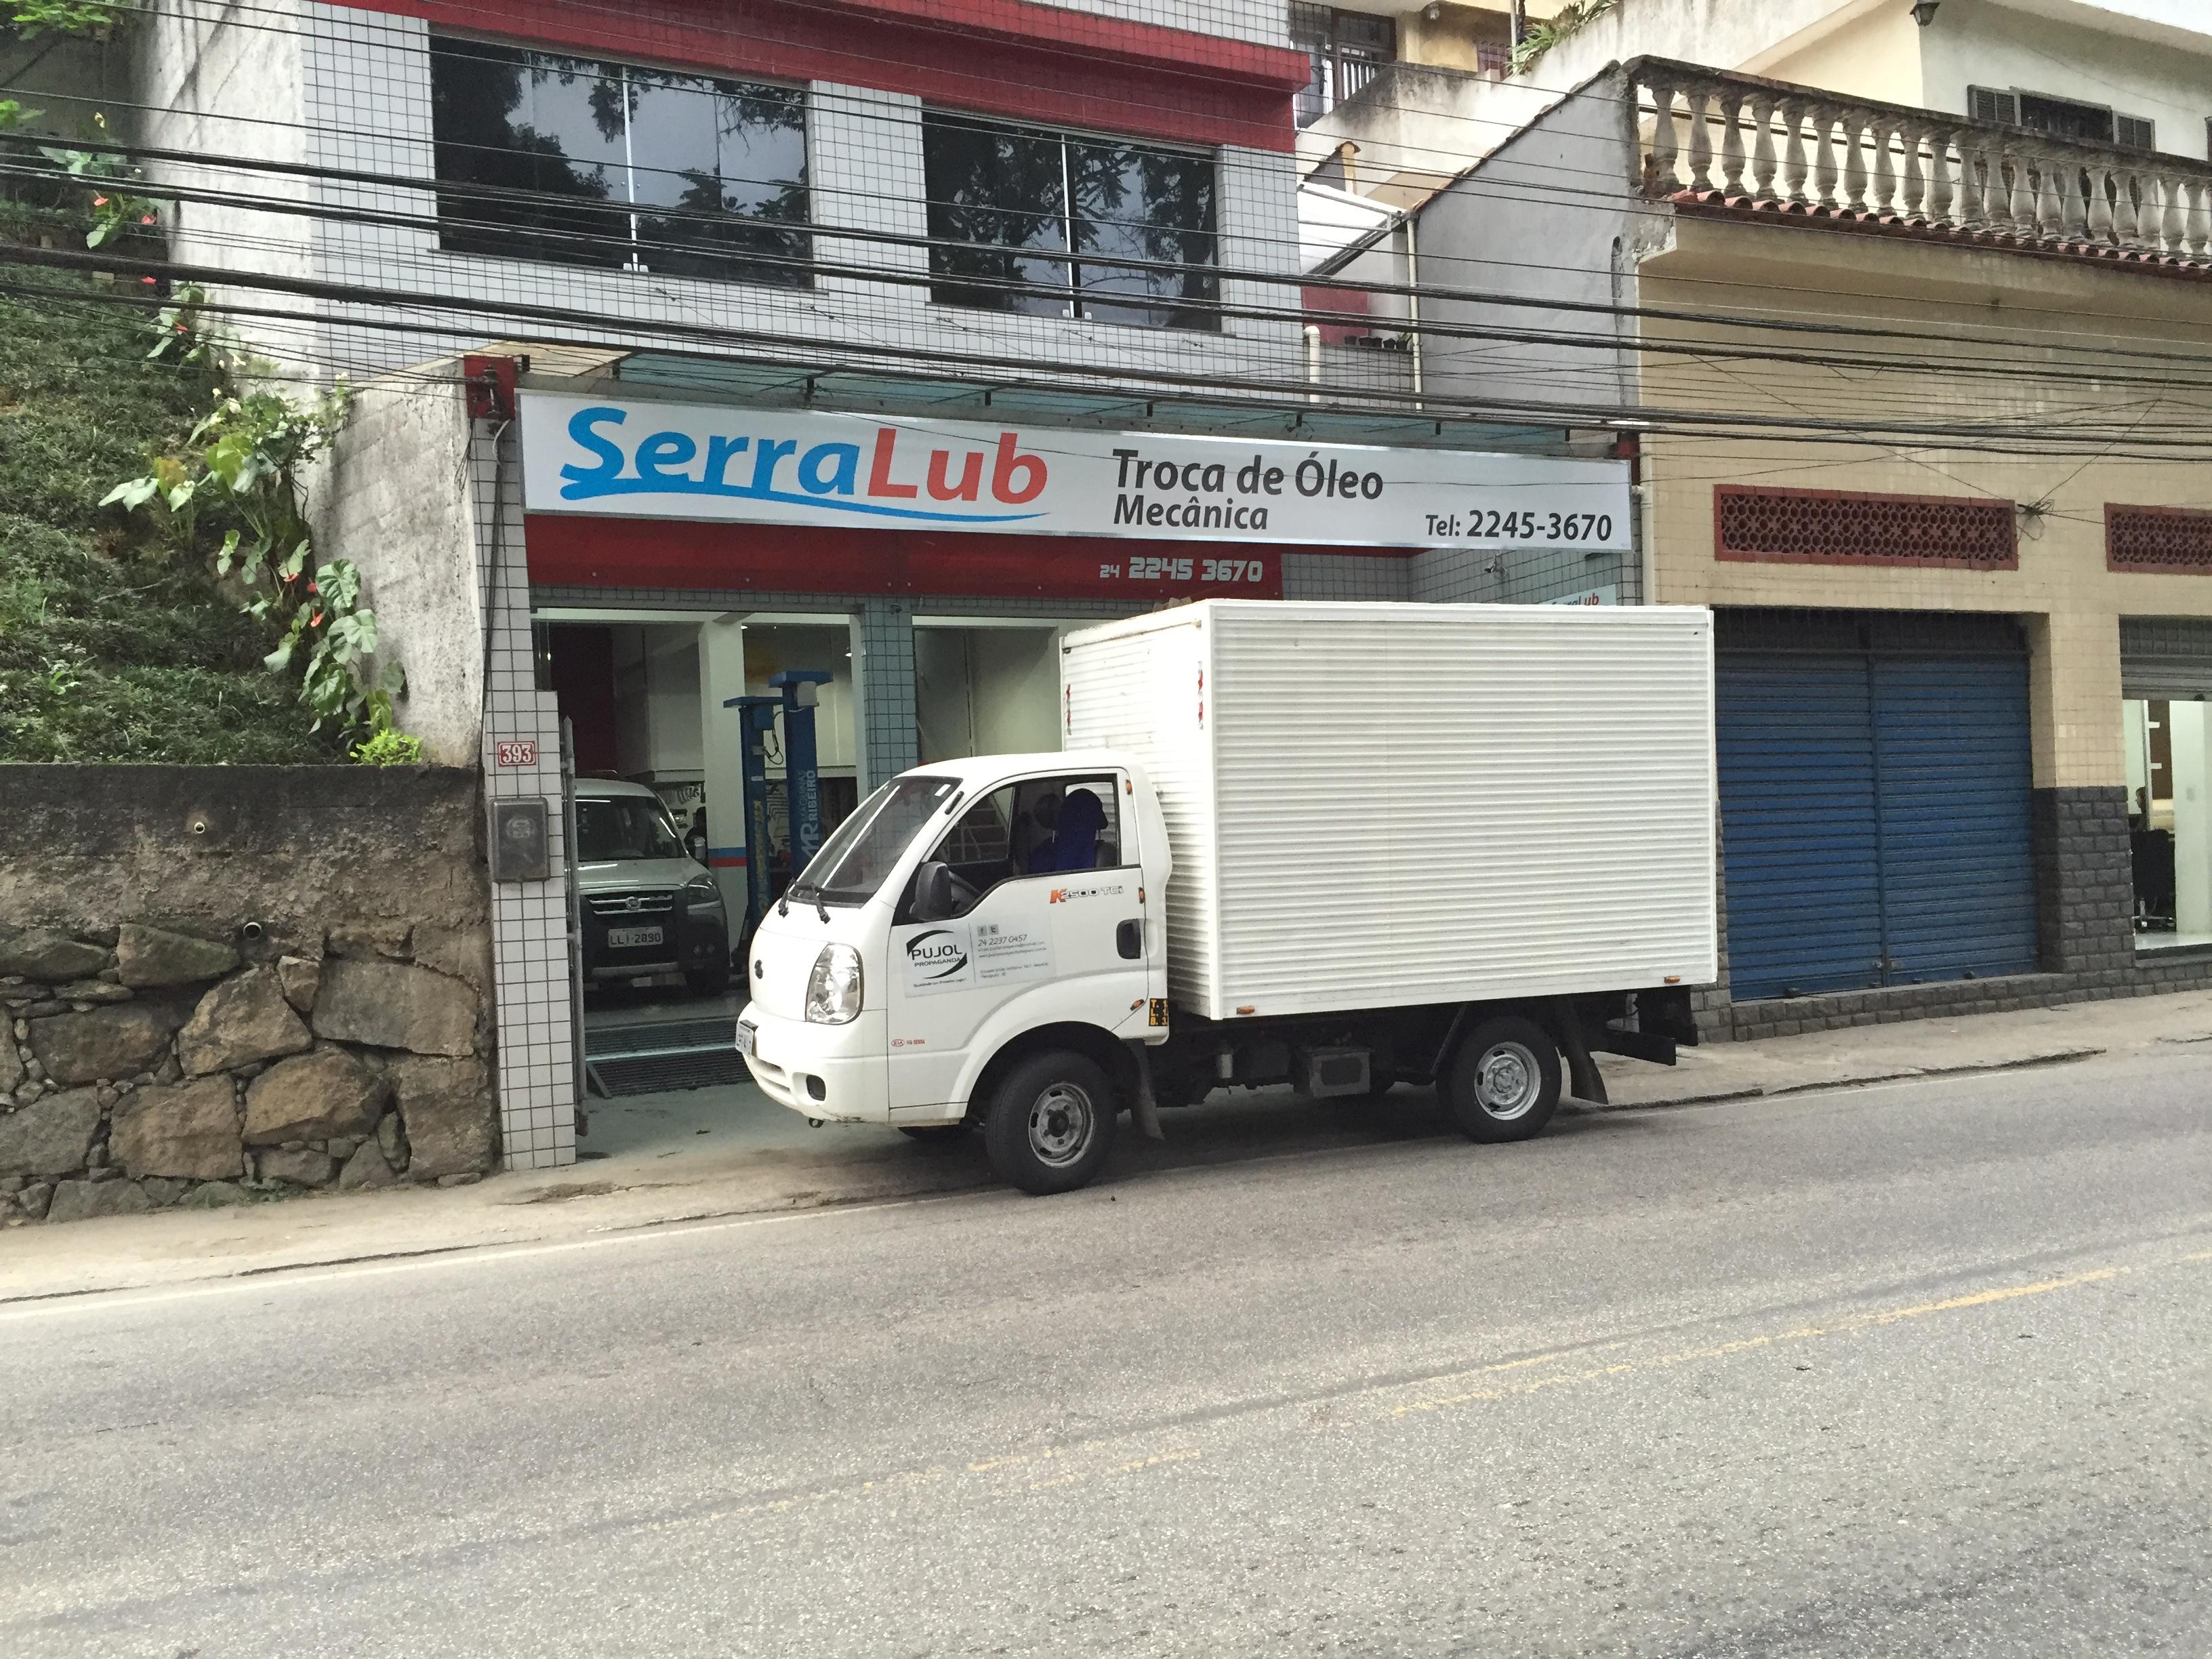 51283 SerraLub 3